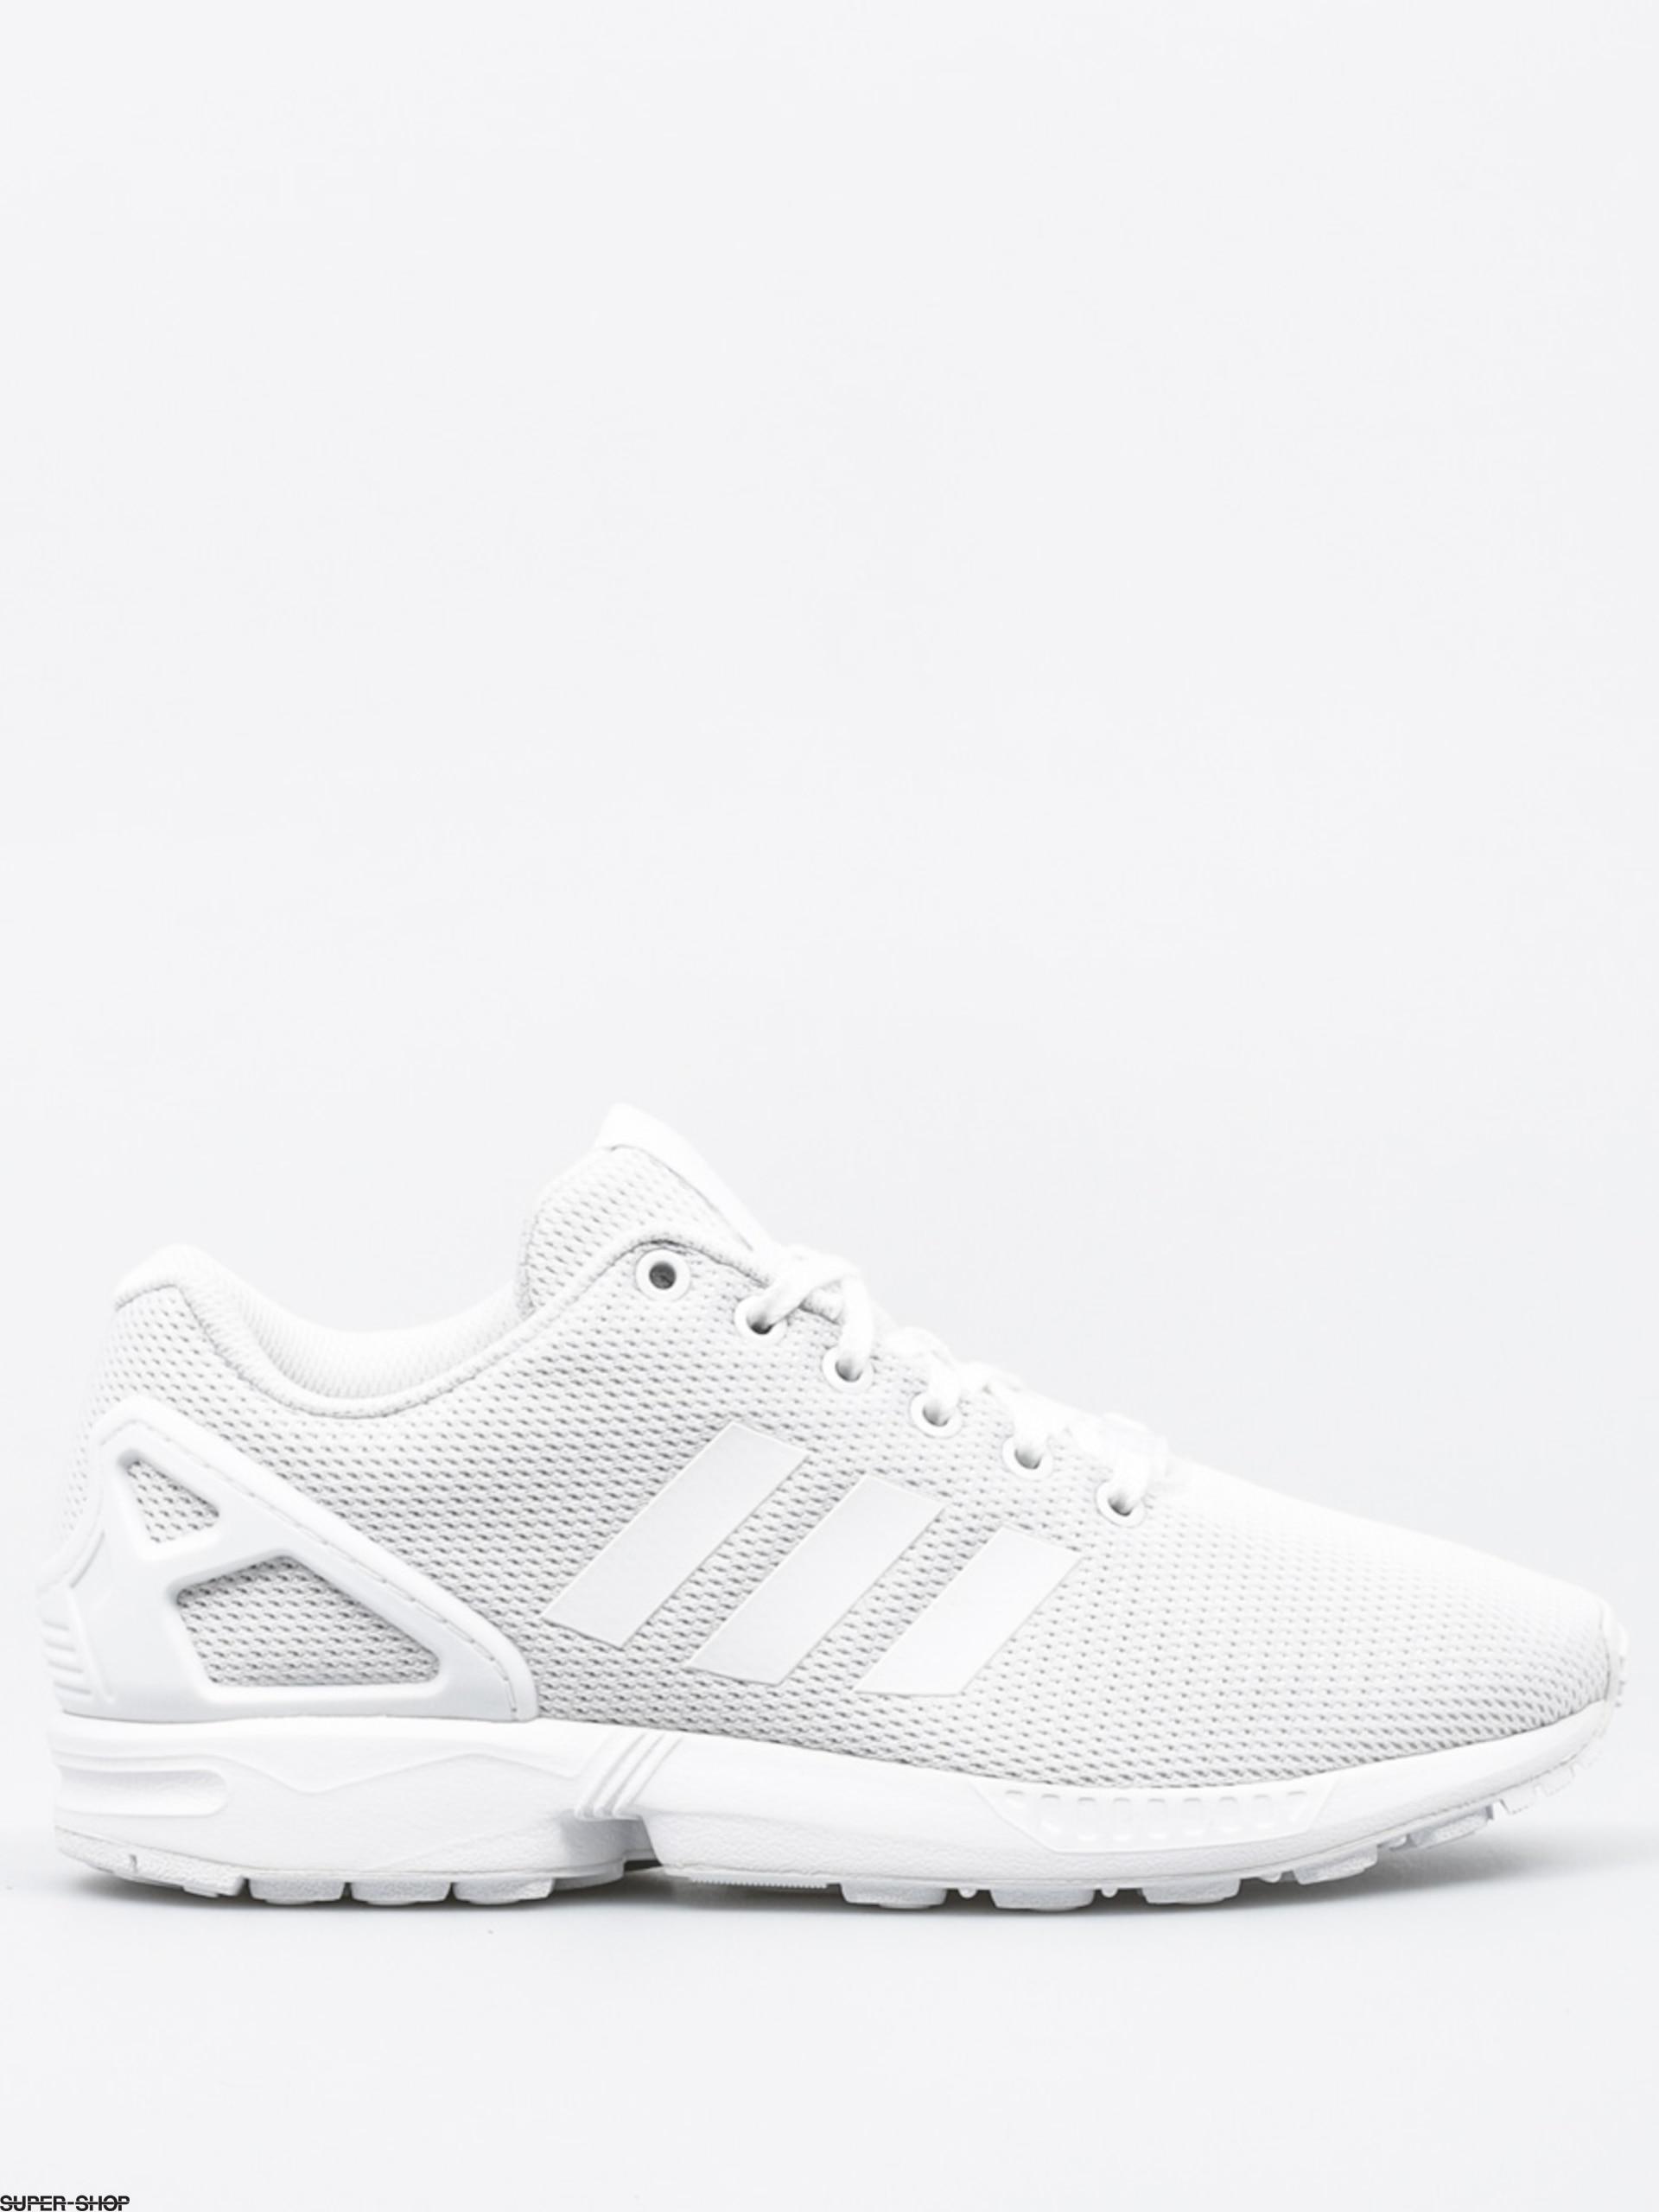 Zx adidas Schuhe Fluxftwwhtftwwhtclgrey adidas Schuhe Fluxftwwhtftwwhtclgrey Zx Owk0Pn